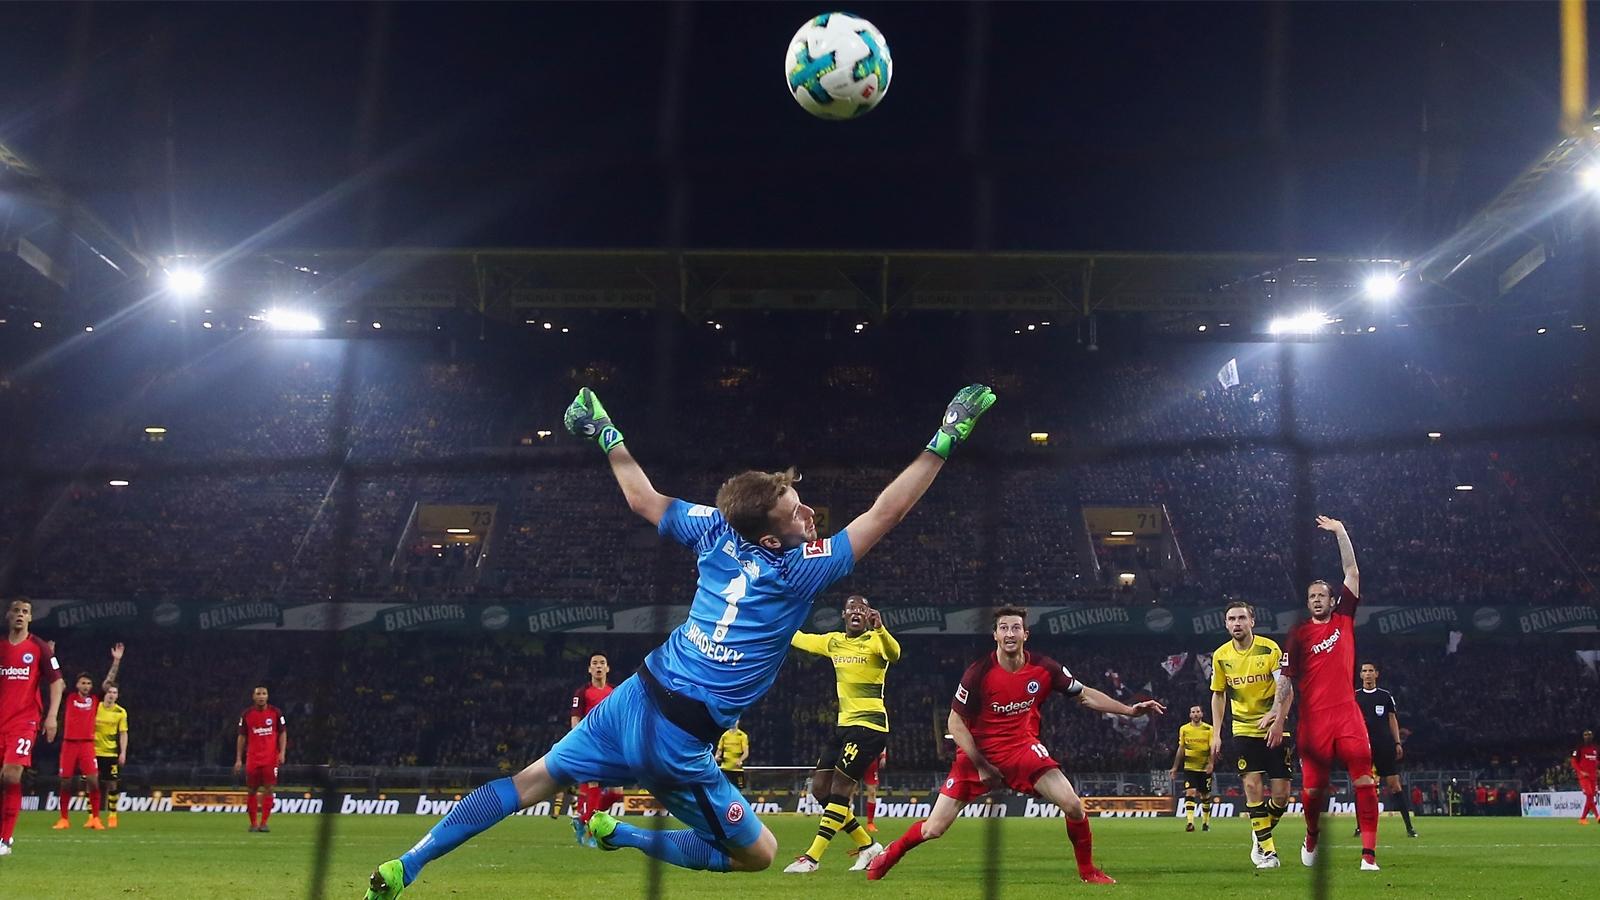 Dortmund klettert dank Batshuayi auf Rang 3 (ARD, Daniel Neuhaus)